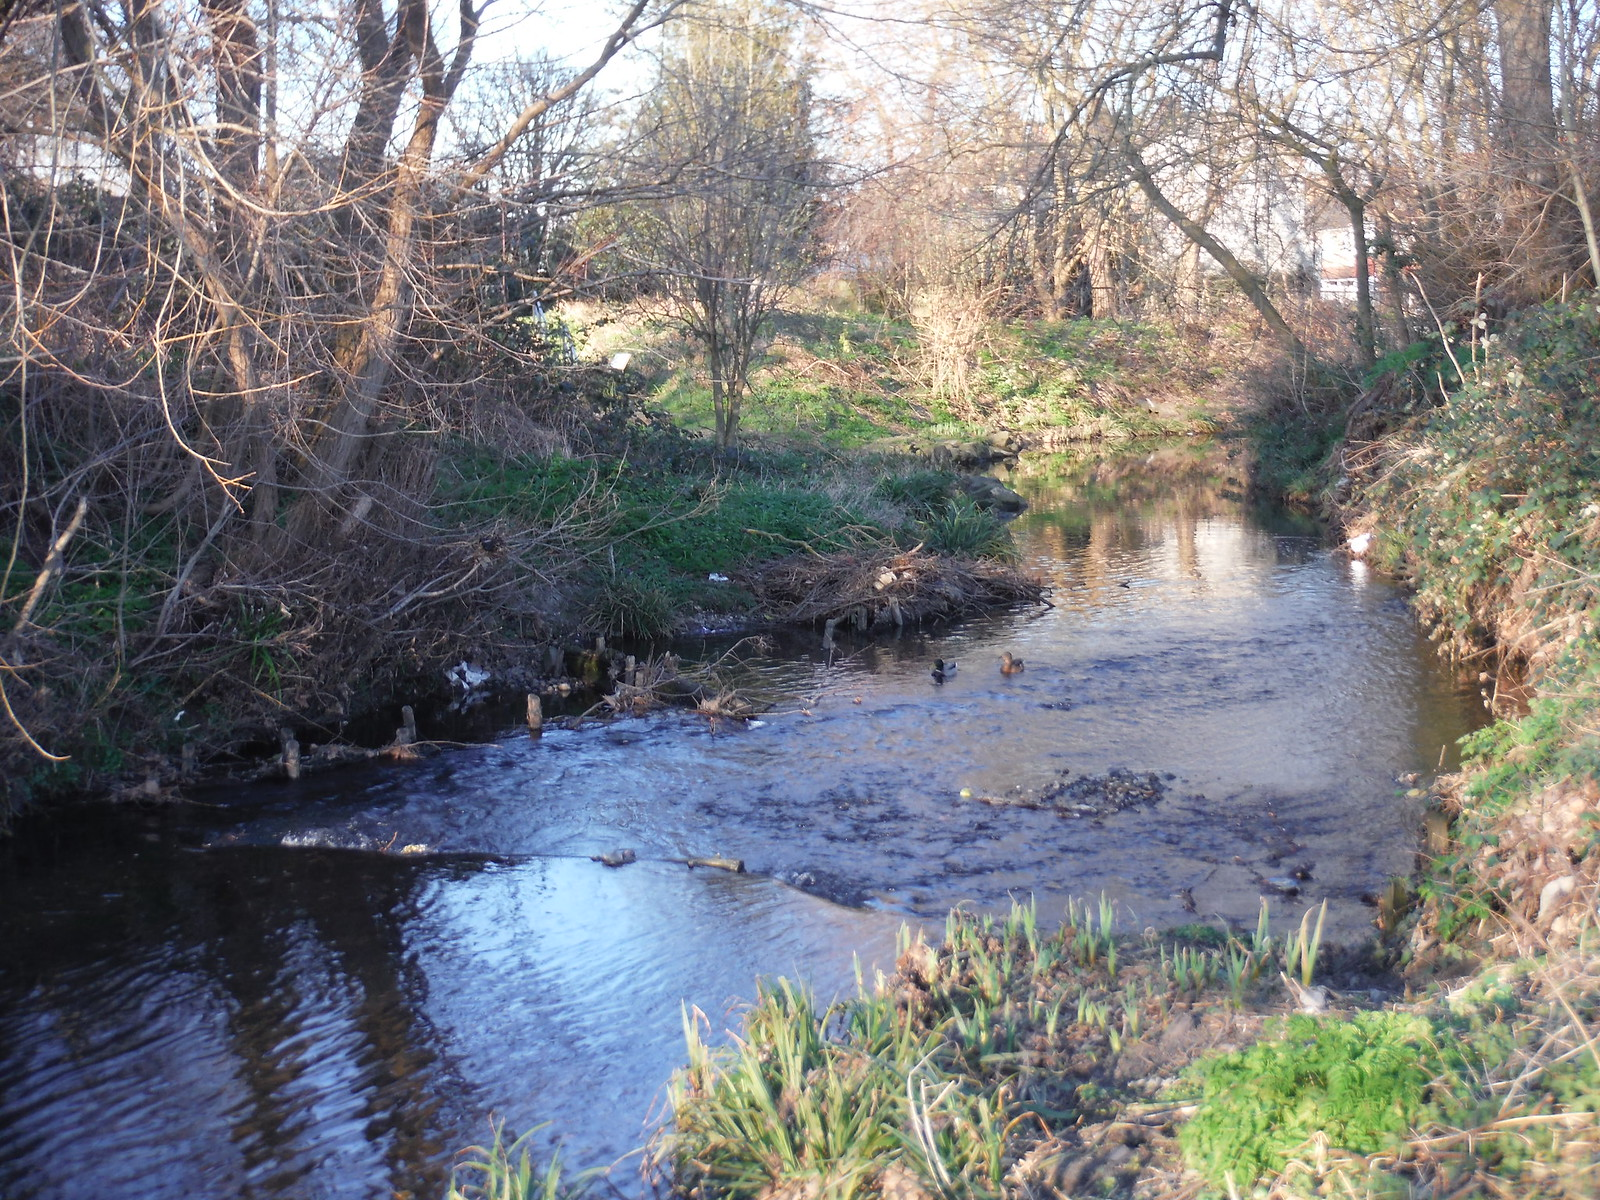 River Ravensbourne, Ladywell Fields SWC Short Walk 36 - Waterlink Way (Lower Sydenham to Greenwich)